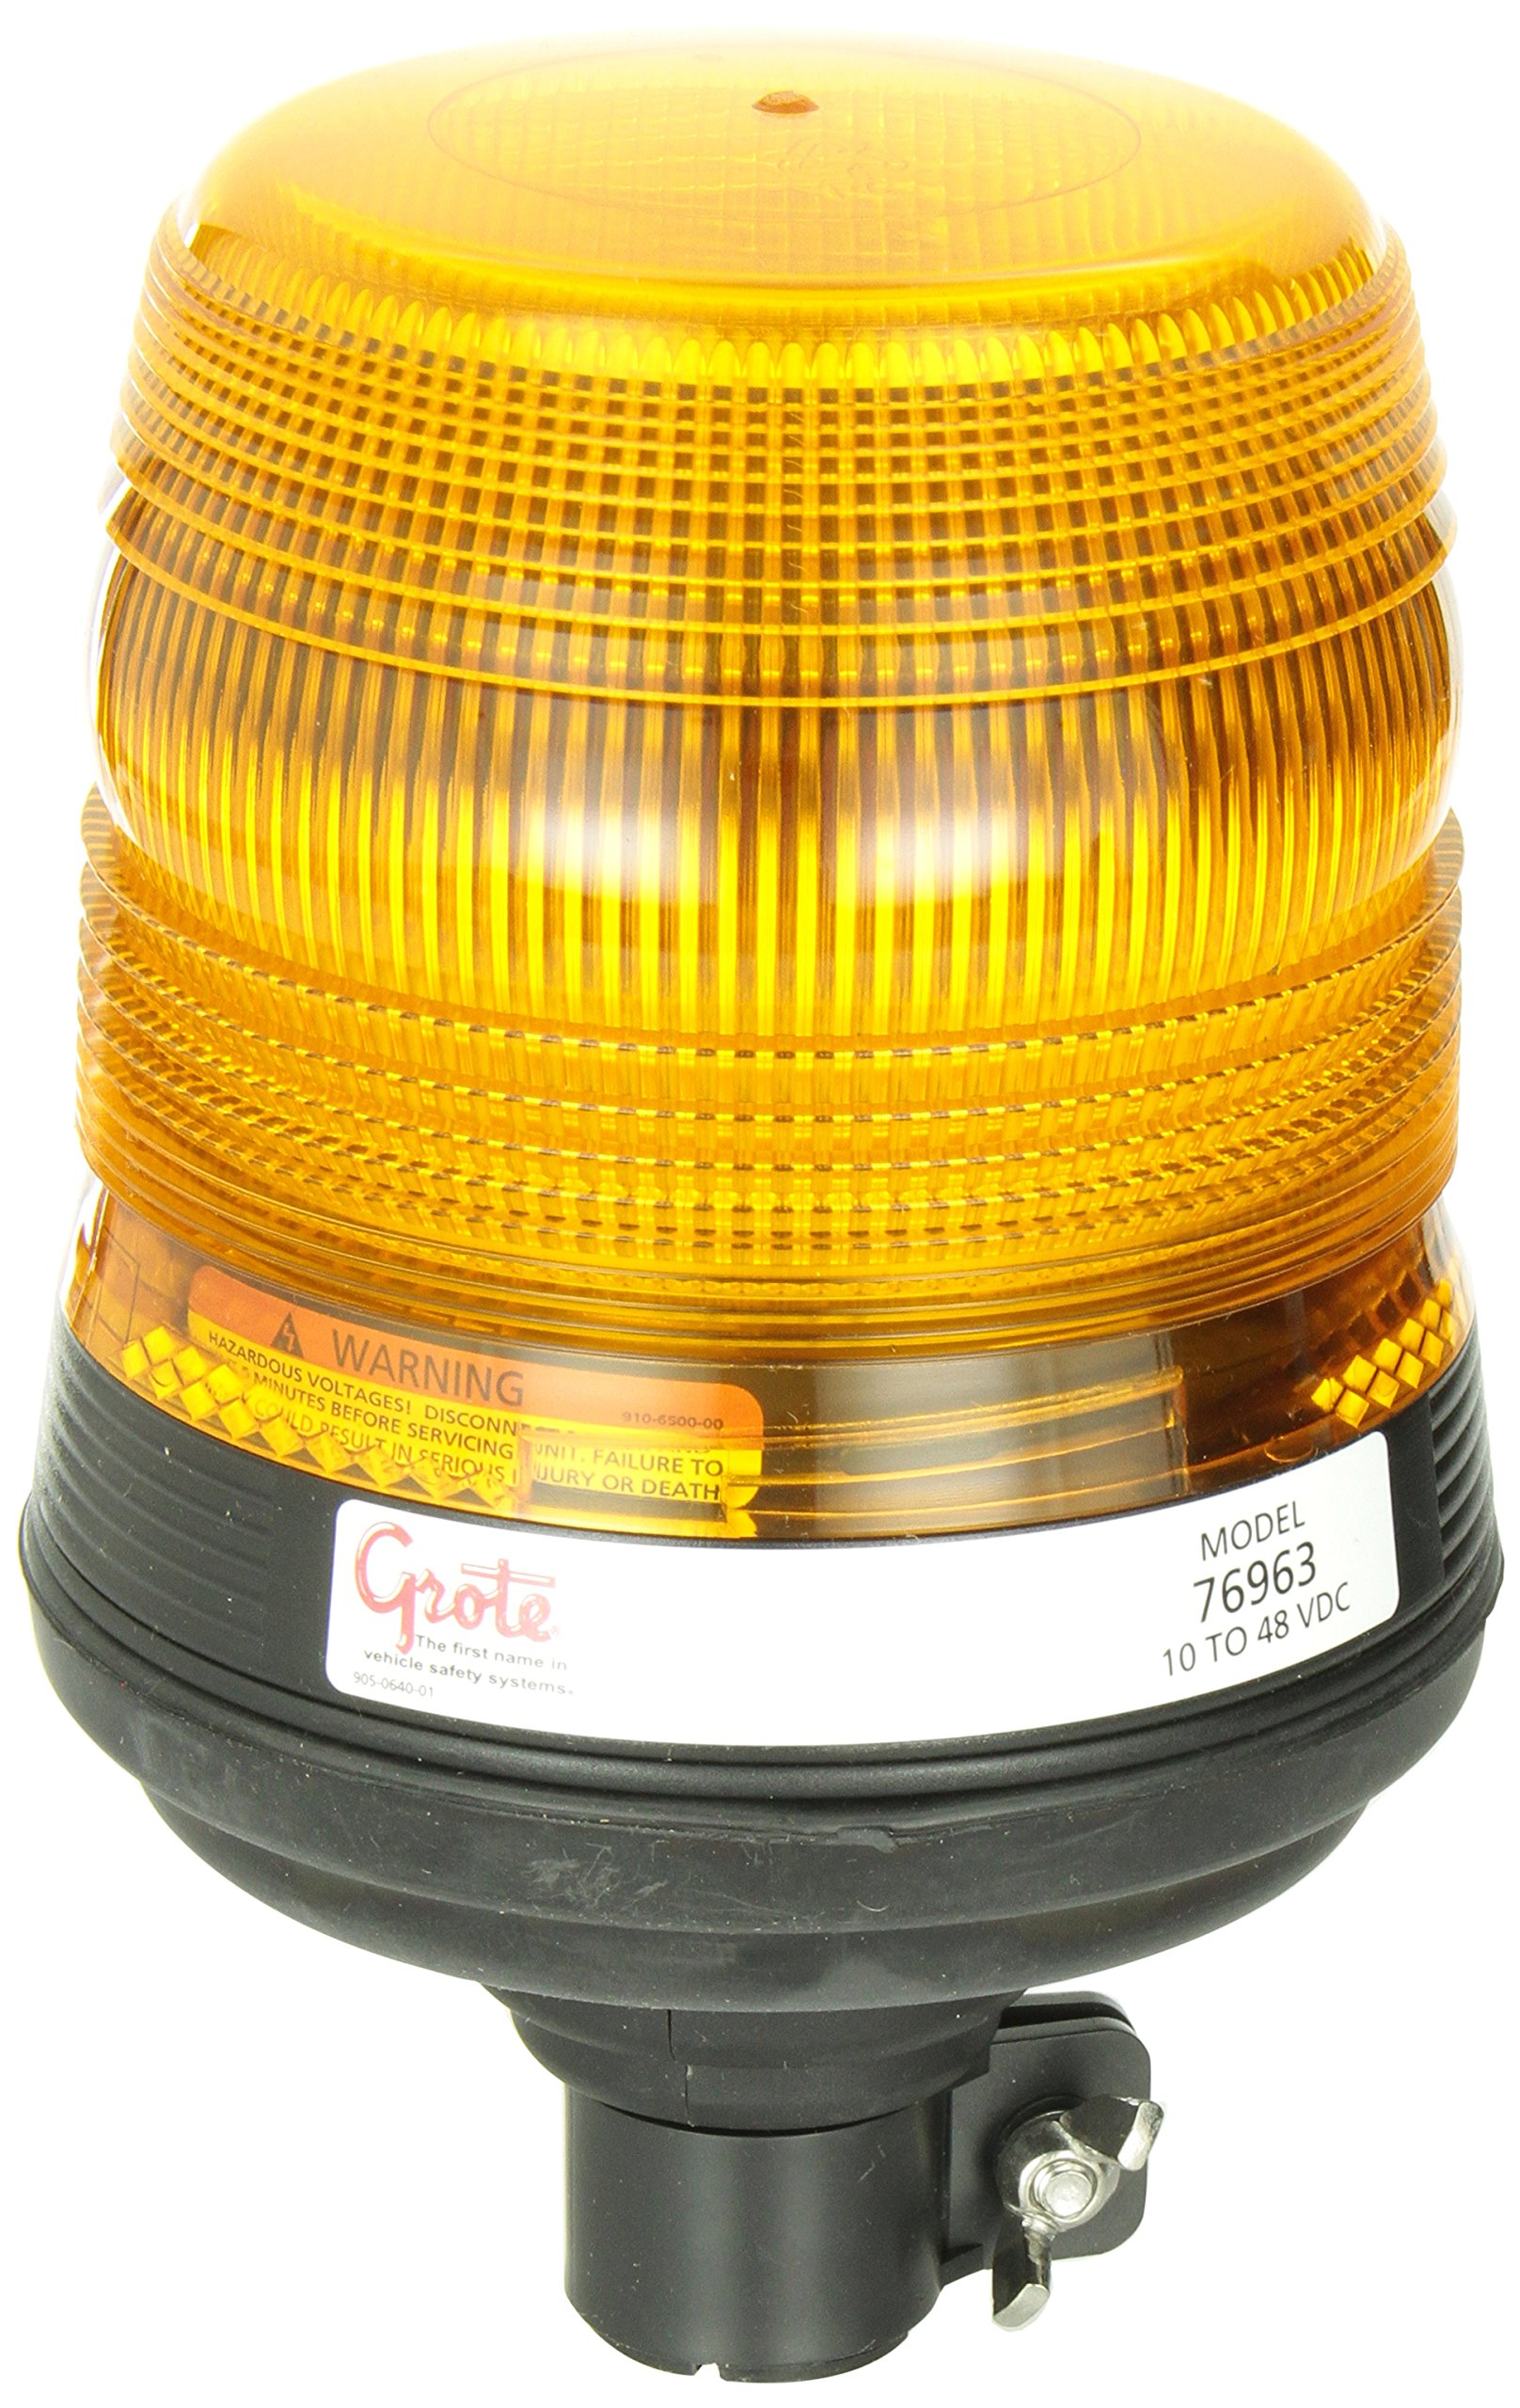 Grote 76963 Yellow Flexible-Base Strobe Light